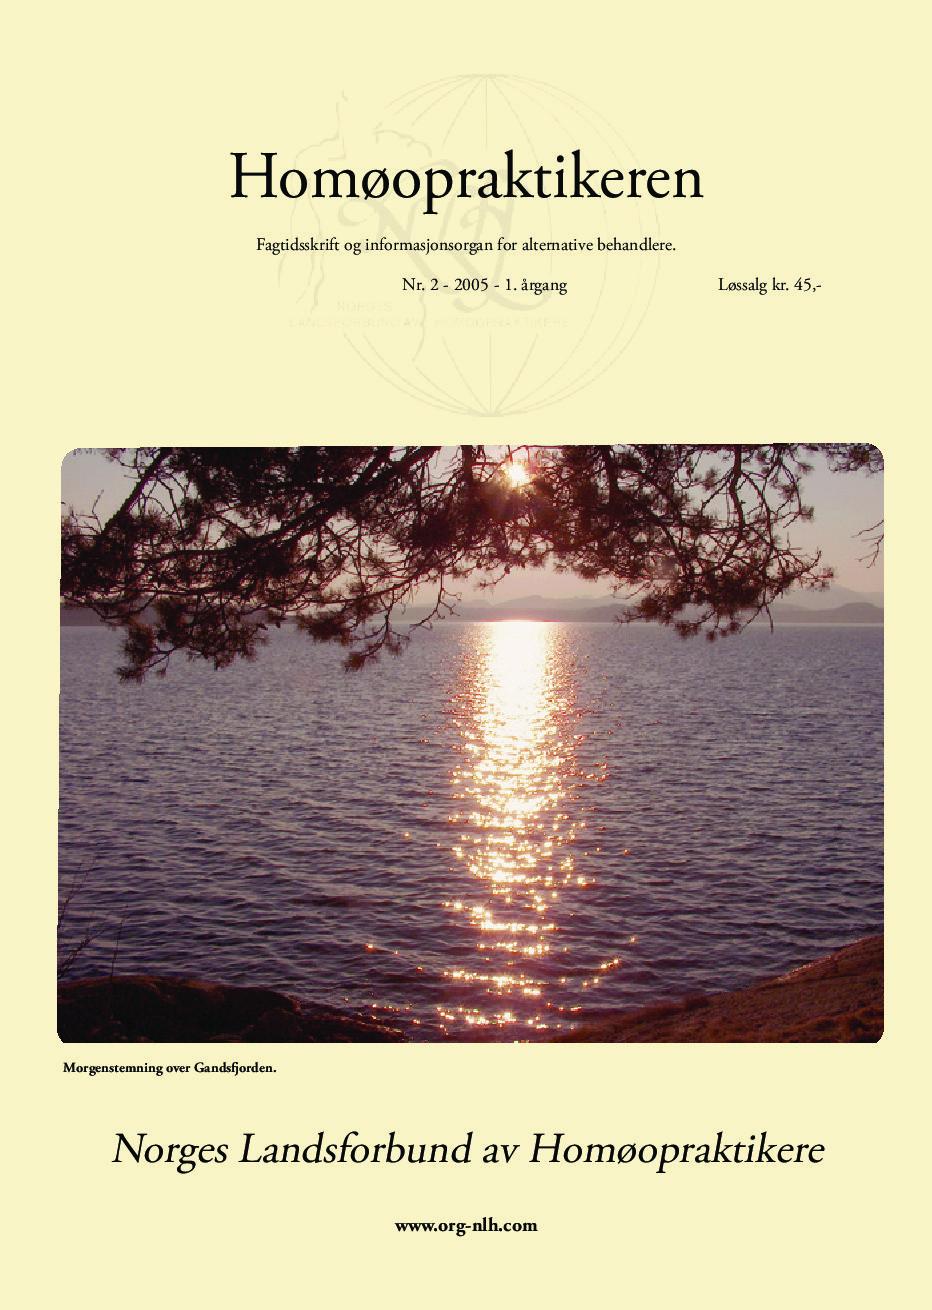 Homøopraktikeren nr. 2-2005